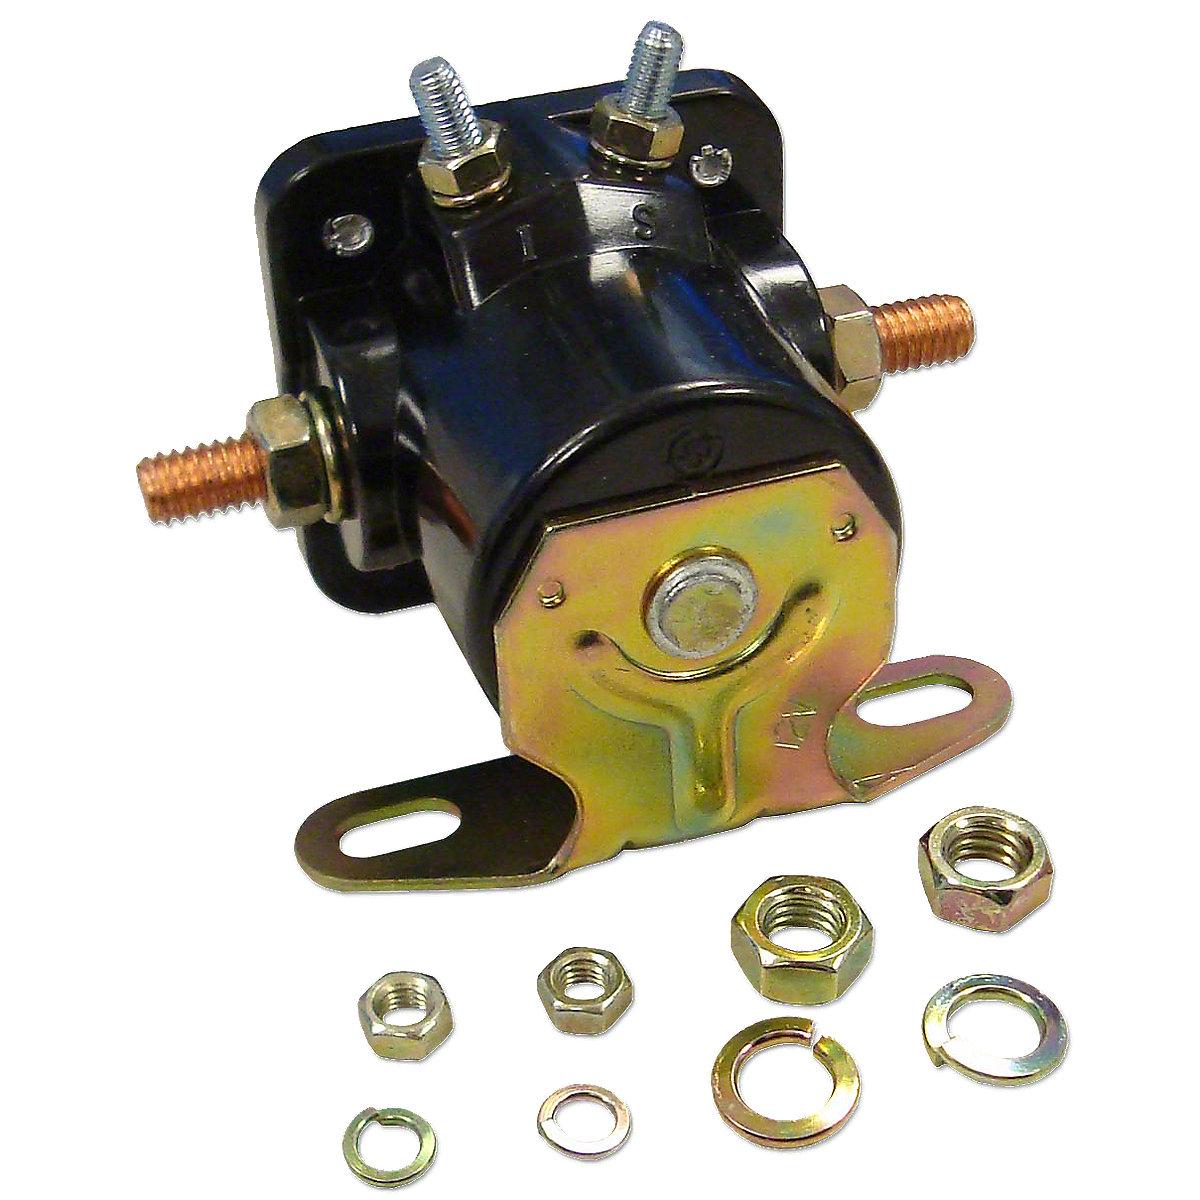 John Deere 12 Volt Bosch Starter Solenoid Manual Guide